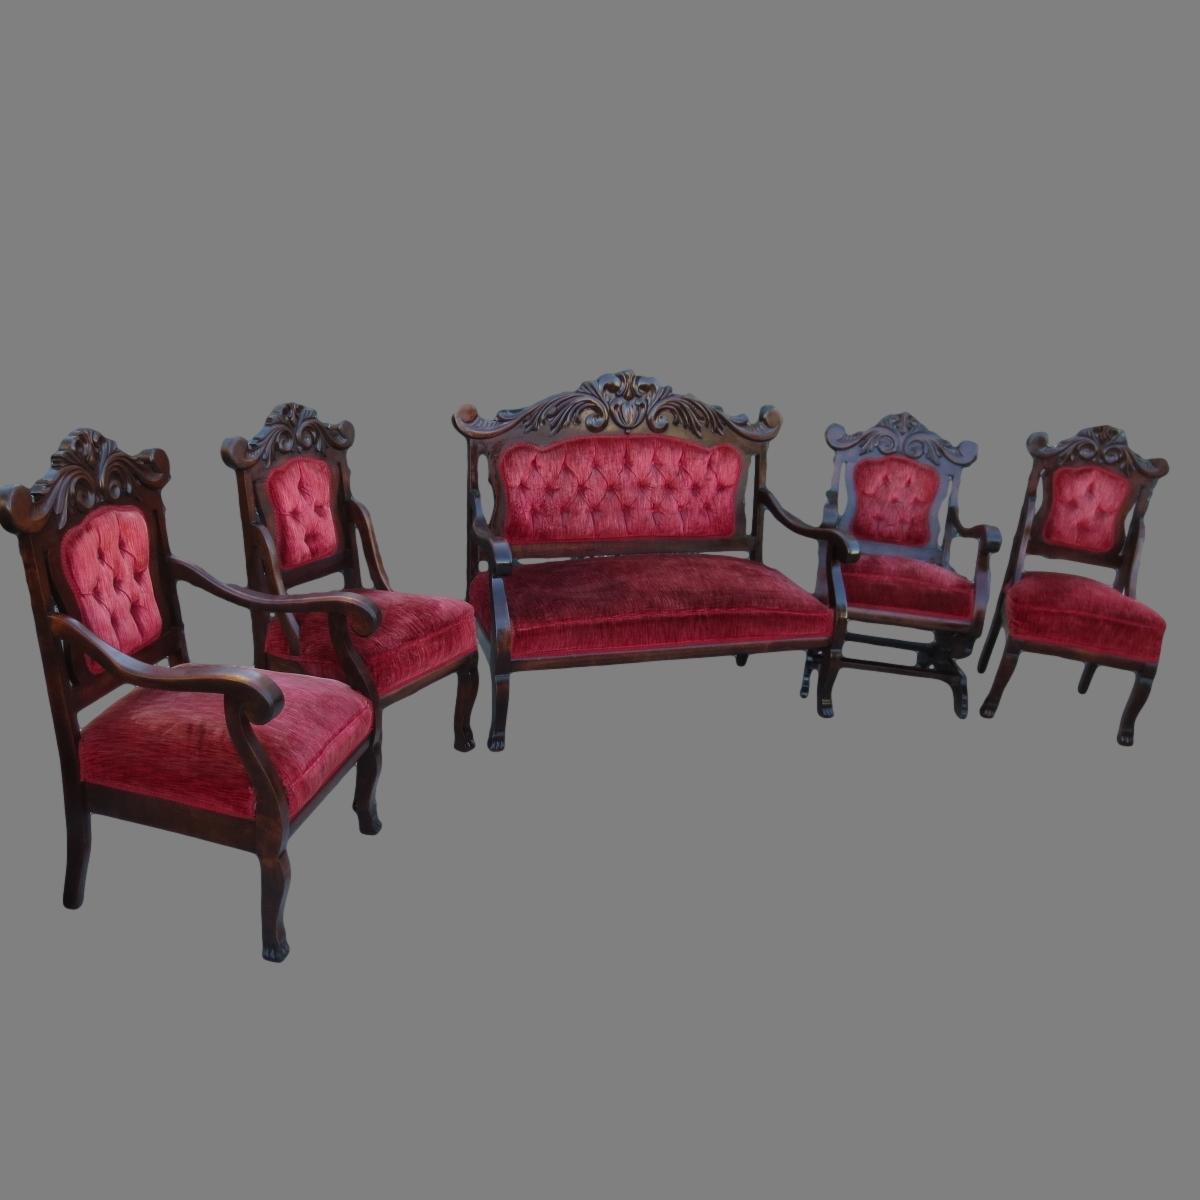 Antique Furniture Antique Sofas Antique Couches Antique Living With Regard To Antique Sofa Chairs (View 15 of 15)